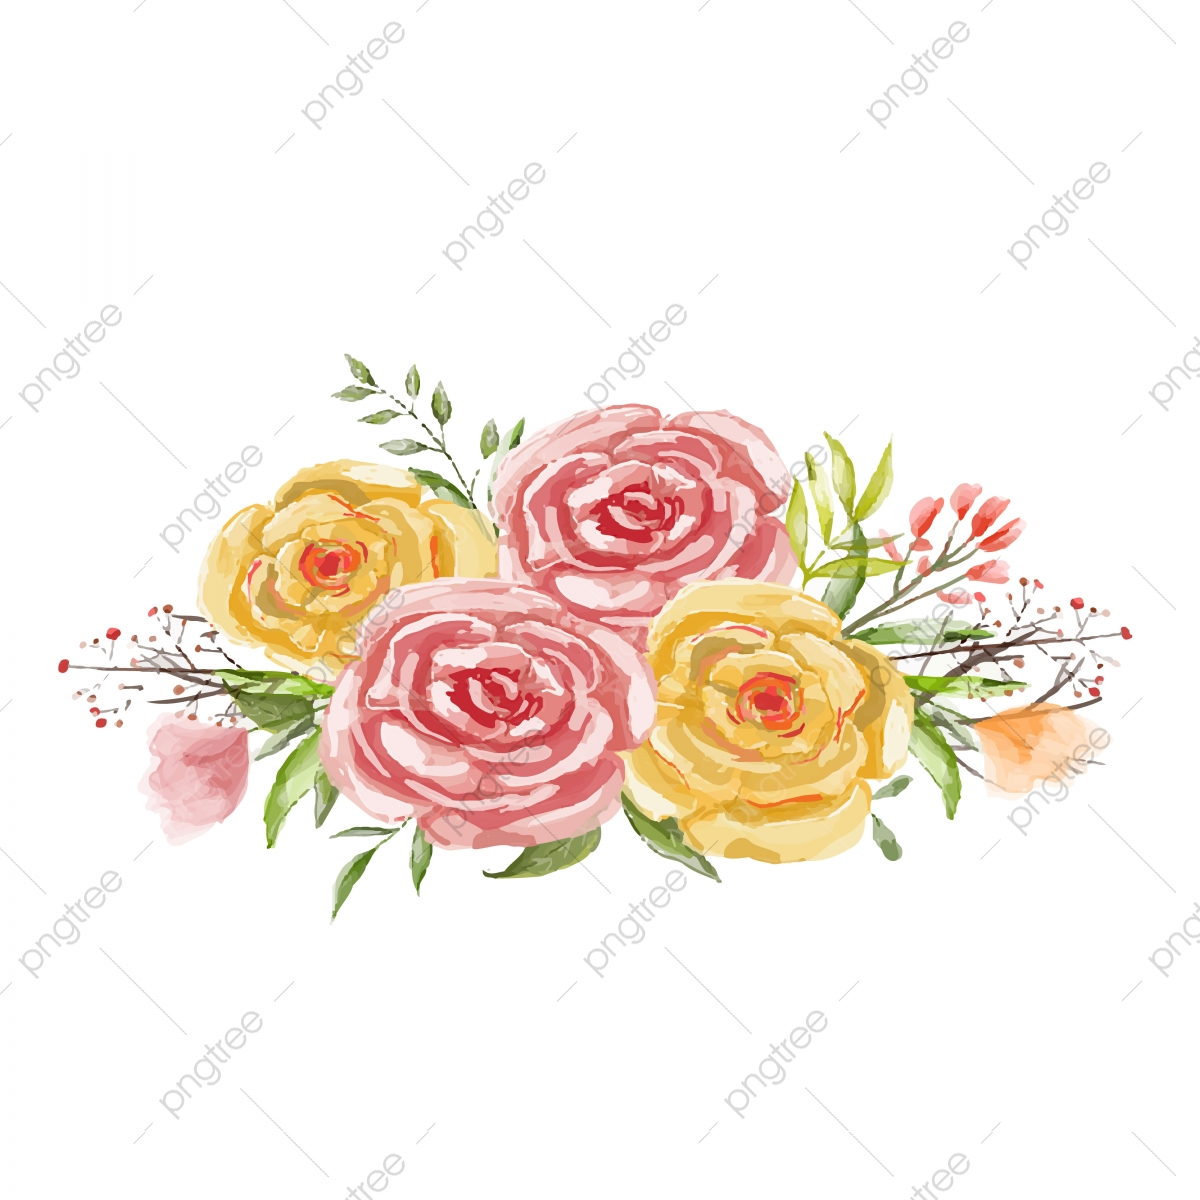 Merah Dan Kuning Bunga Bunga Dan Daun Hijau Untuk Vector Romantis